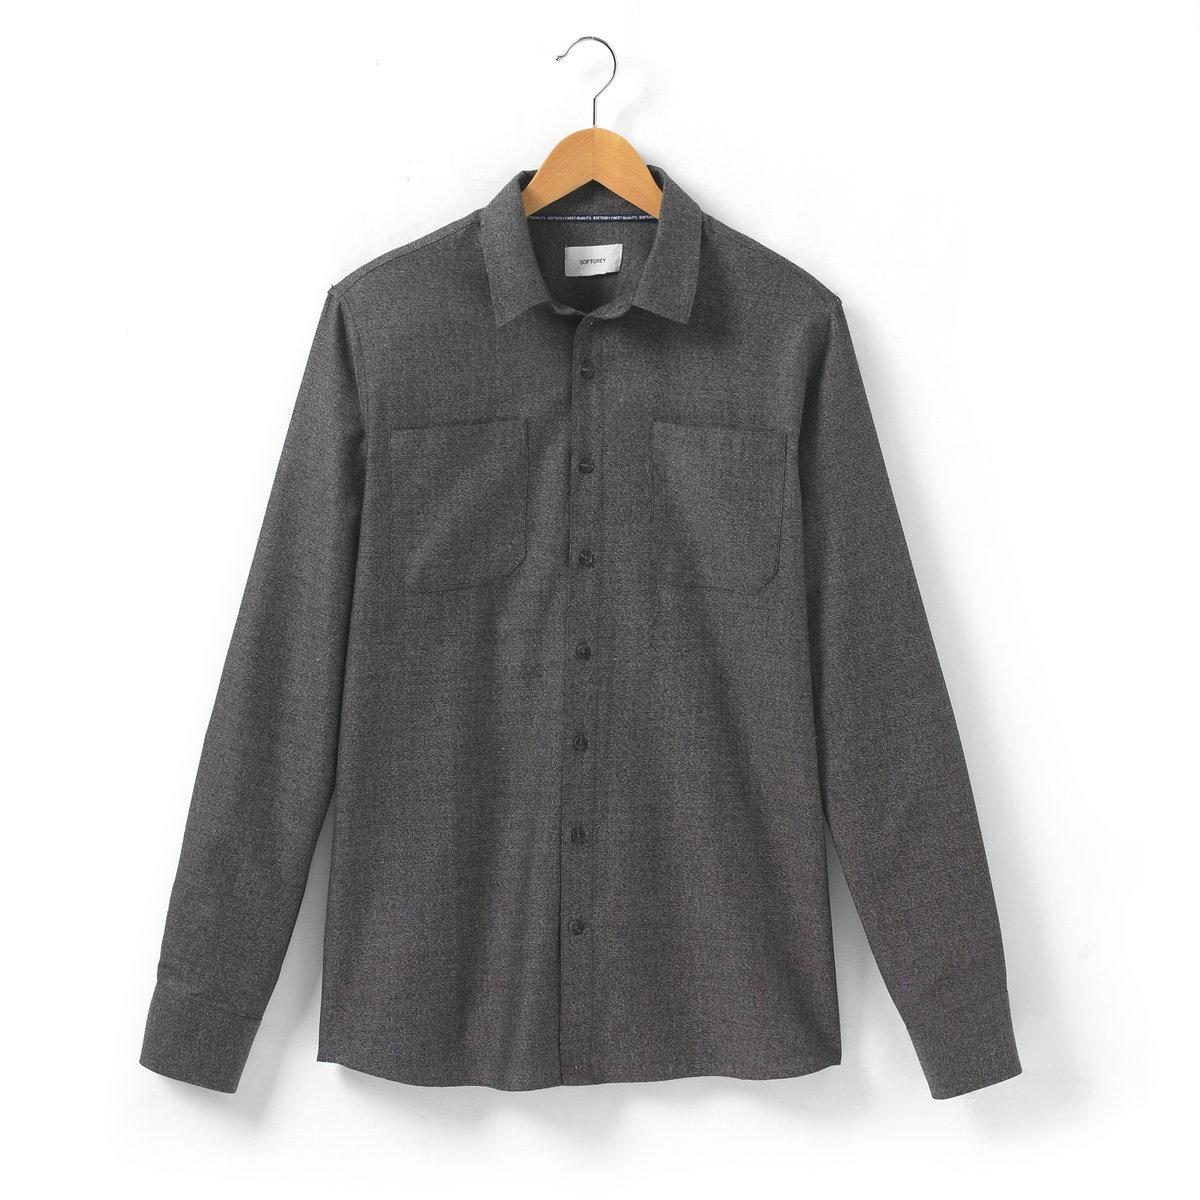 Рубашка однотоннаяОднотонная рубашка с длинными рукавами SOFT GREY. Свободные края воротника. 2 накладных нагрудных кармана. Застежка на пуговицы. Манжеты с застежкой на пуговицы. Длина 77 см. Рубашка, 100% хлопка.<br><br>Цвет: серый<br>Размер: 37/38